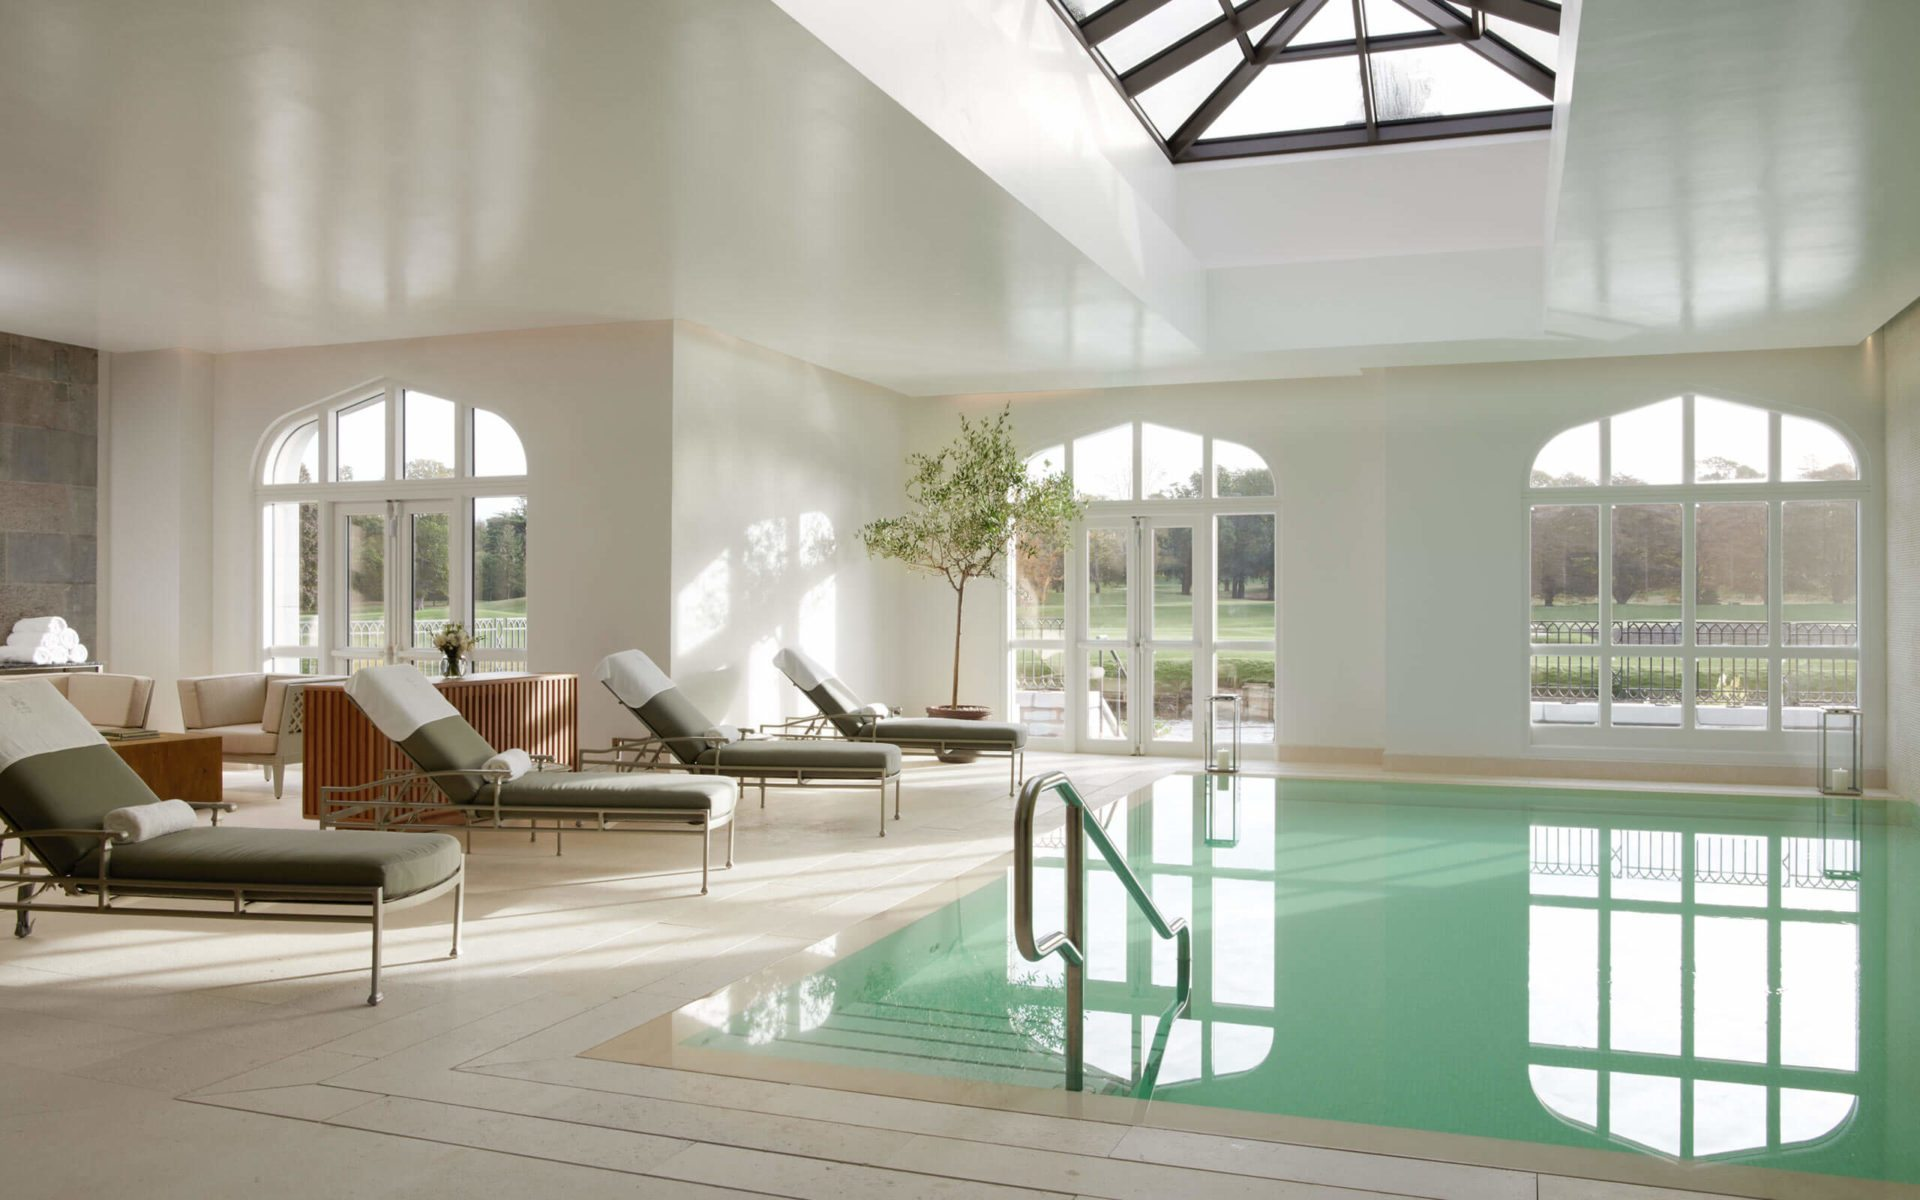 The Adare Manor Hotel Spa and Pool Area